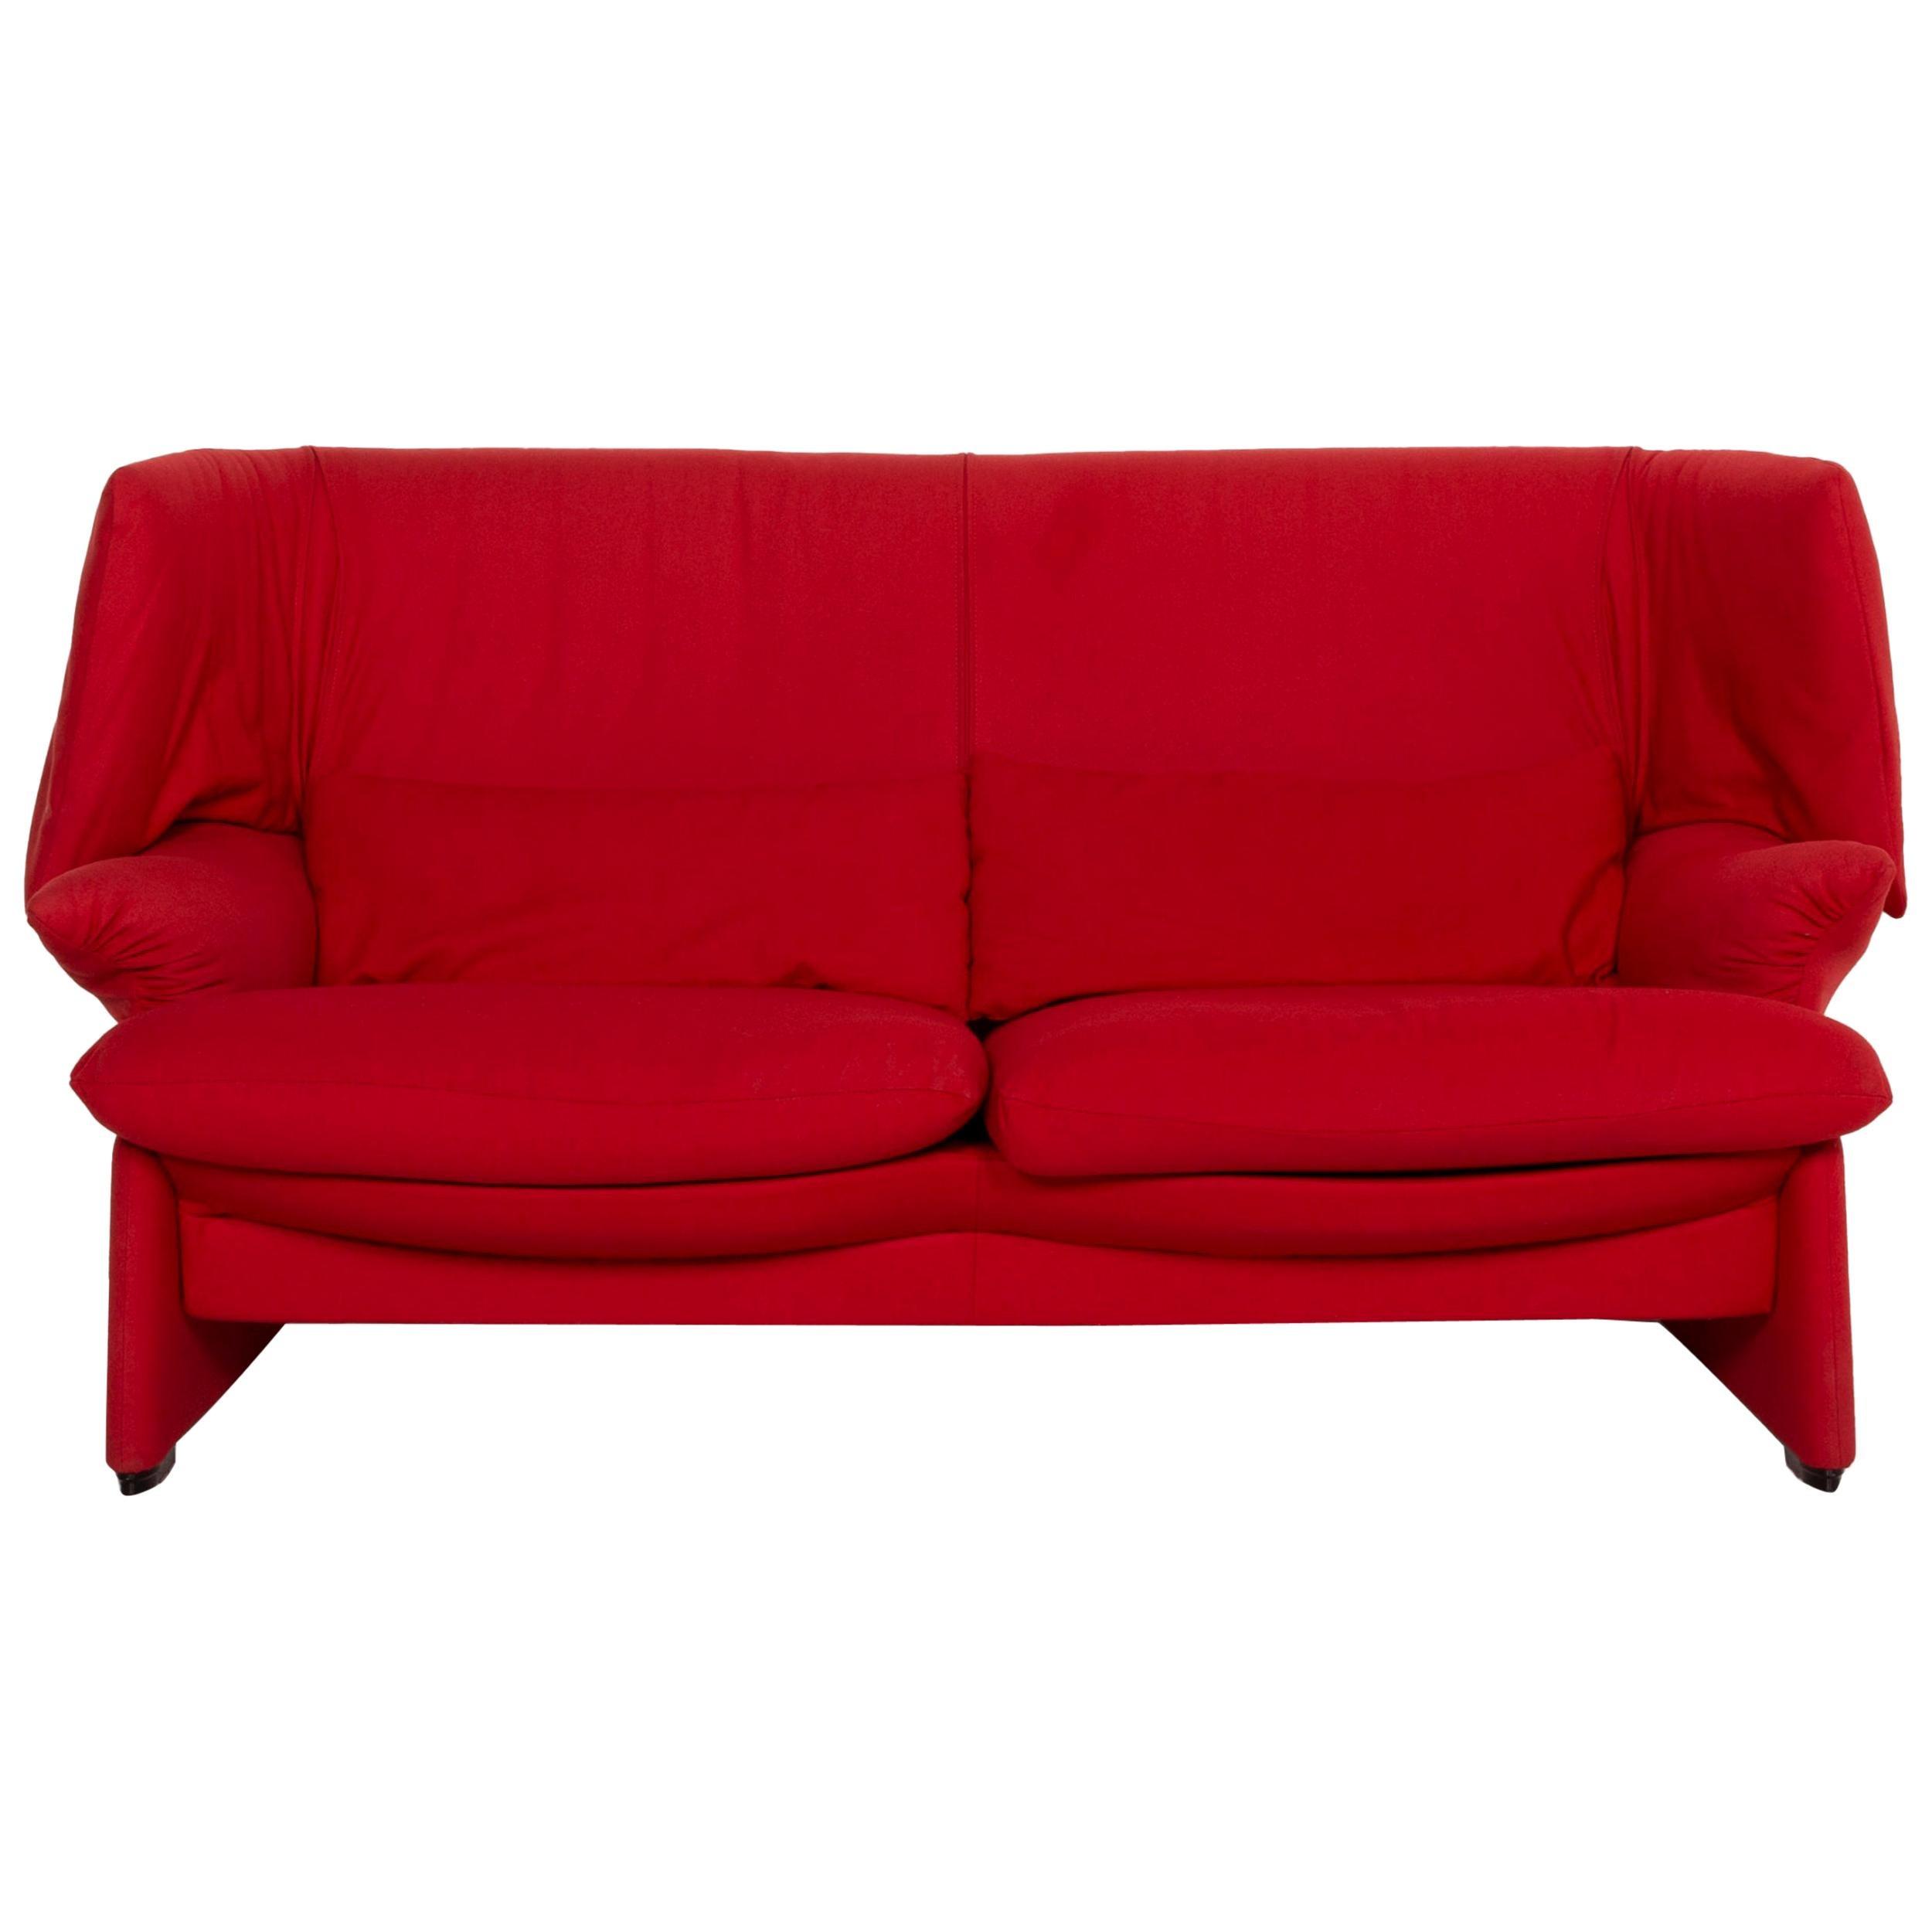 Cassina Maralunga Fabric Sofa Red Two-Seater